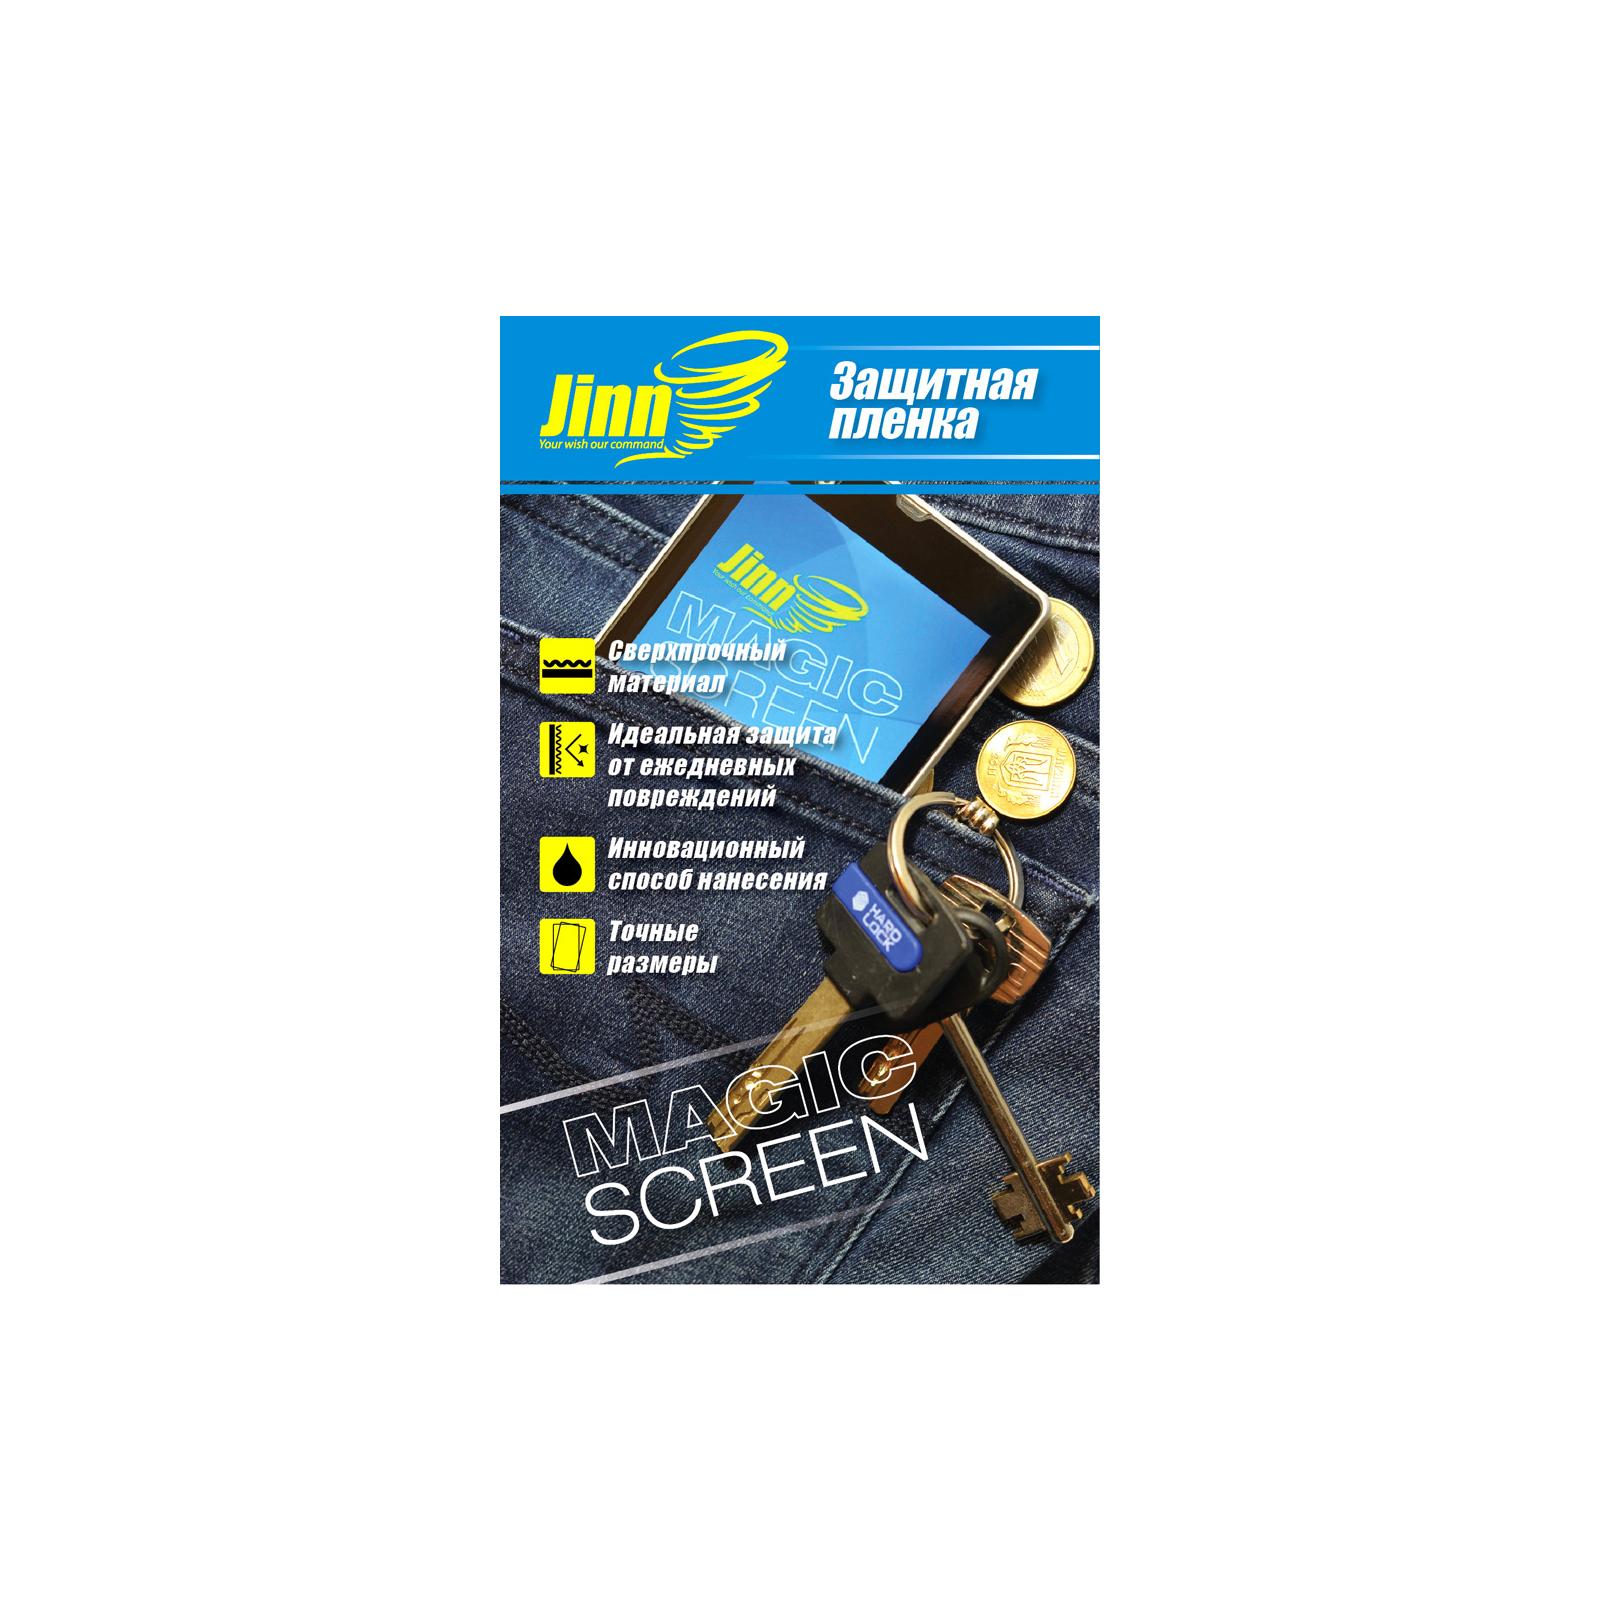 Пленка защитная JINN ультрапрочная Magic Screen для Lenovo IdeaPhone S860 (Lenovo IdeaPhone S860 front)